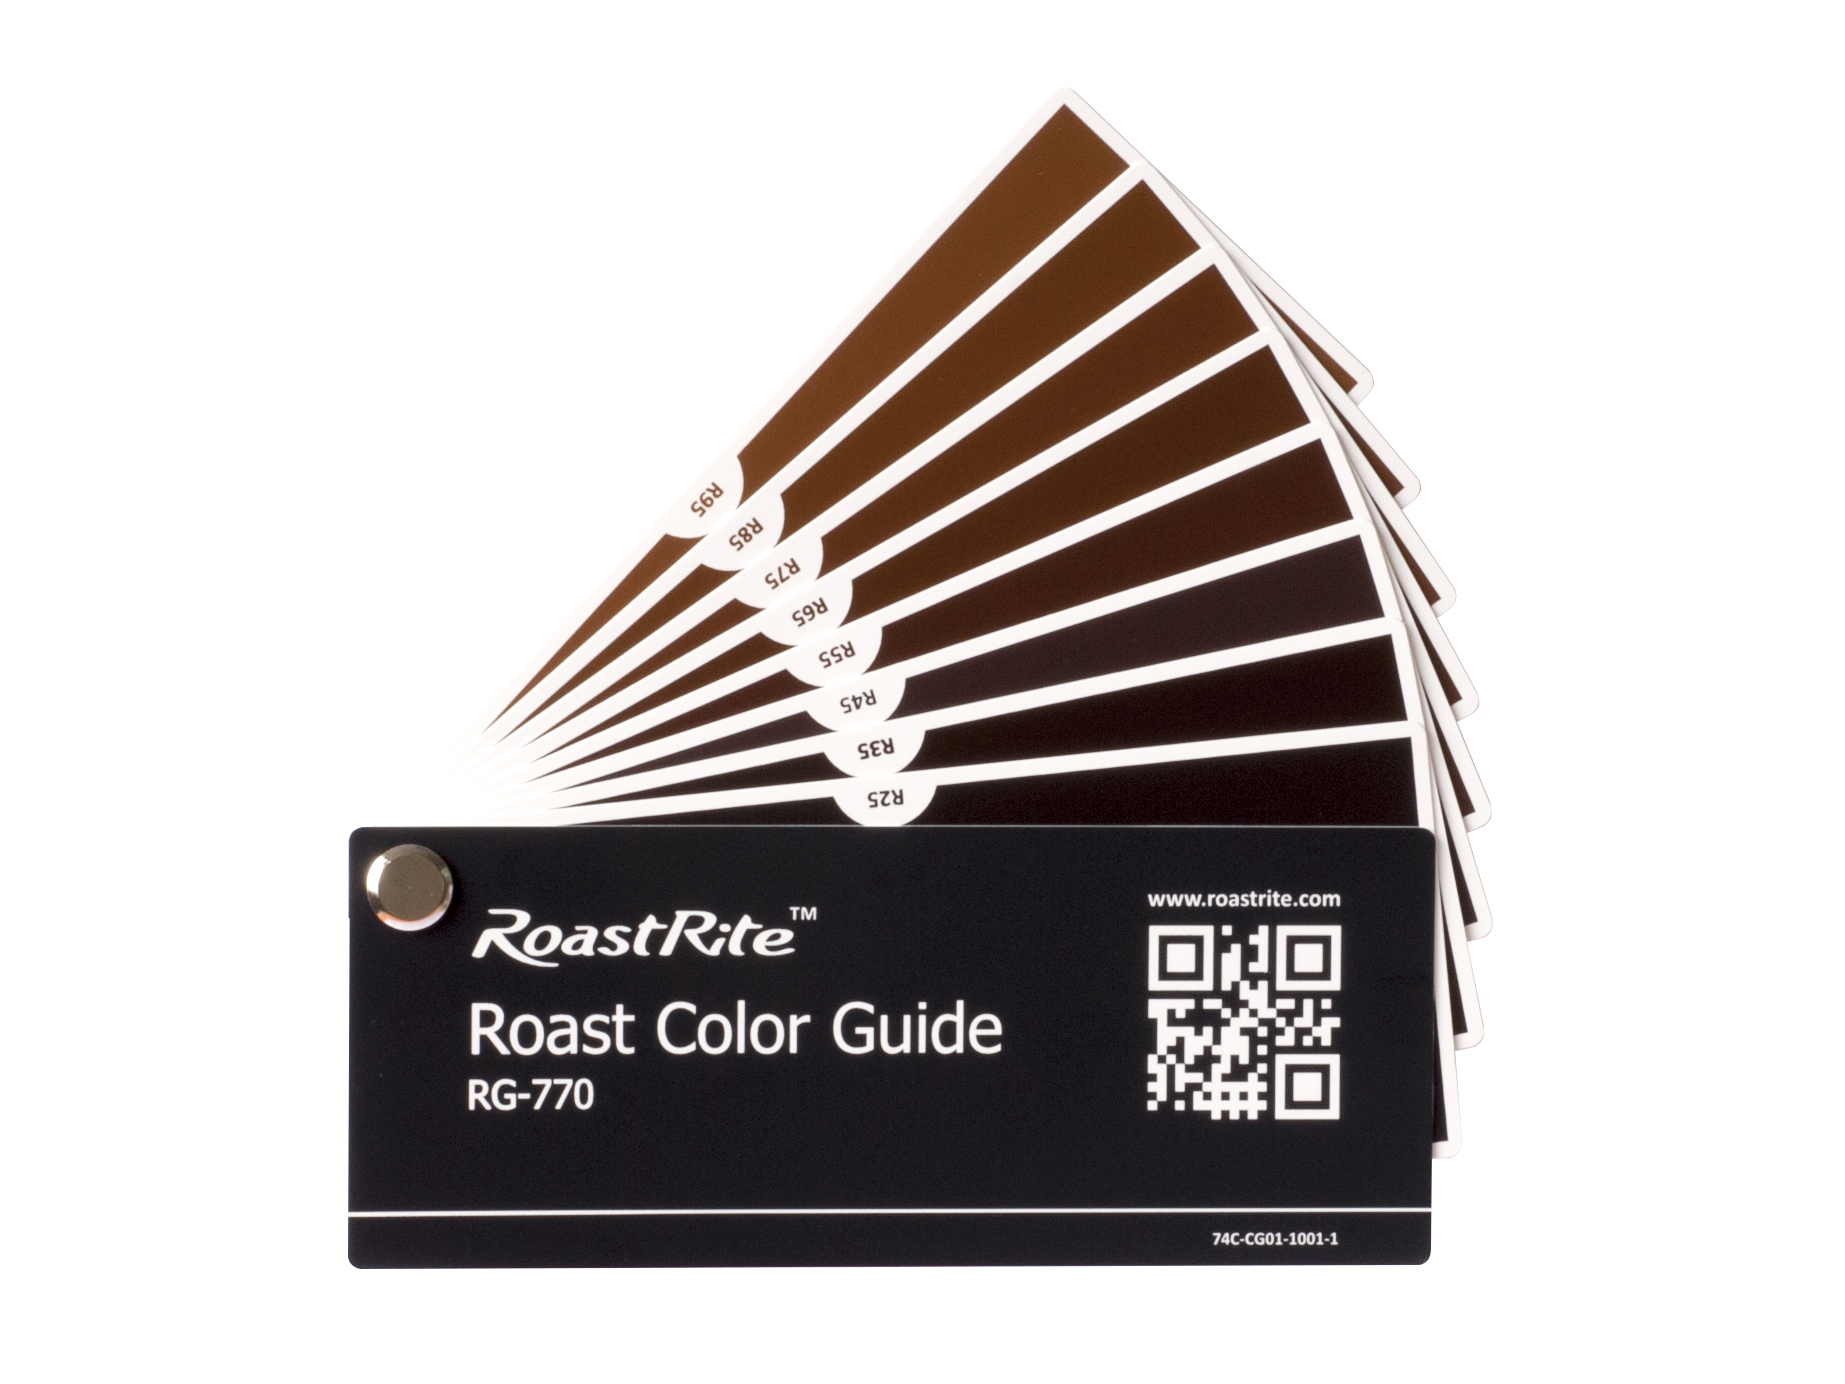 RoastRite Roast Color Guide RG-770